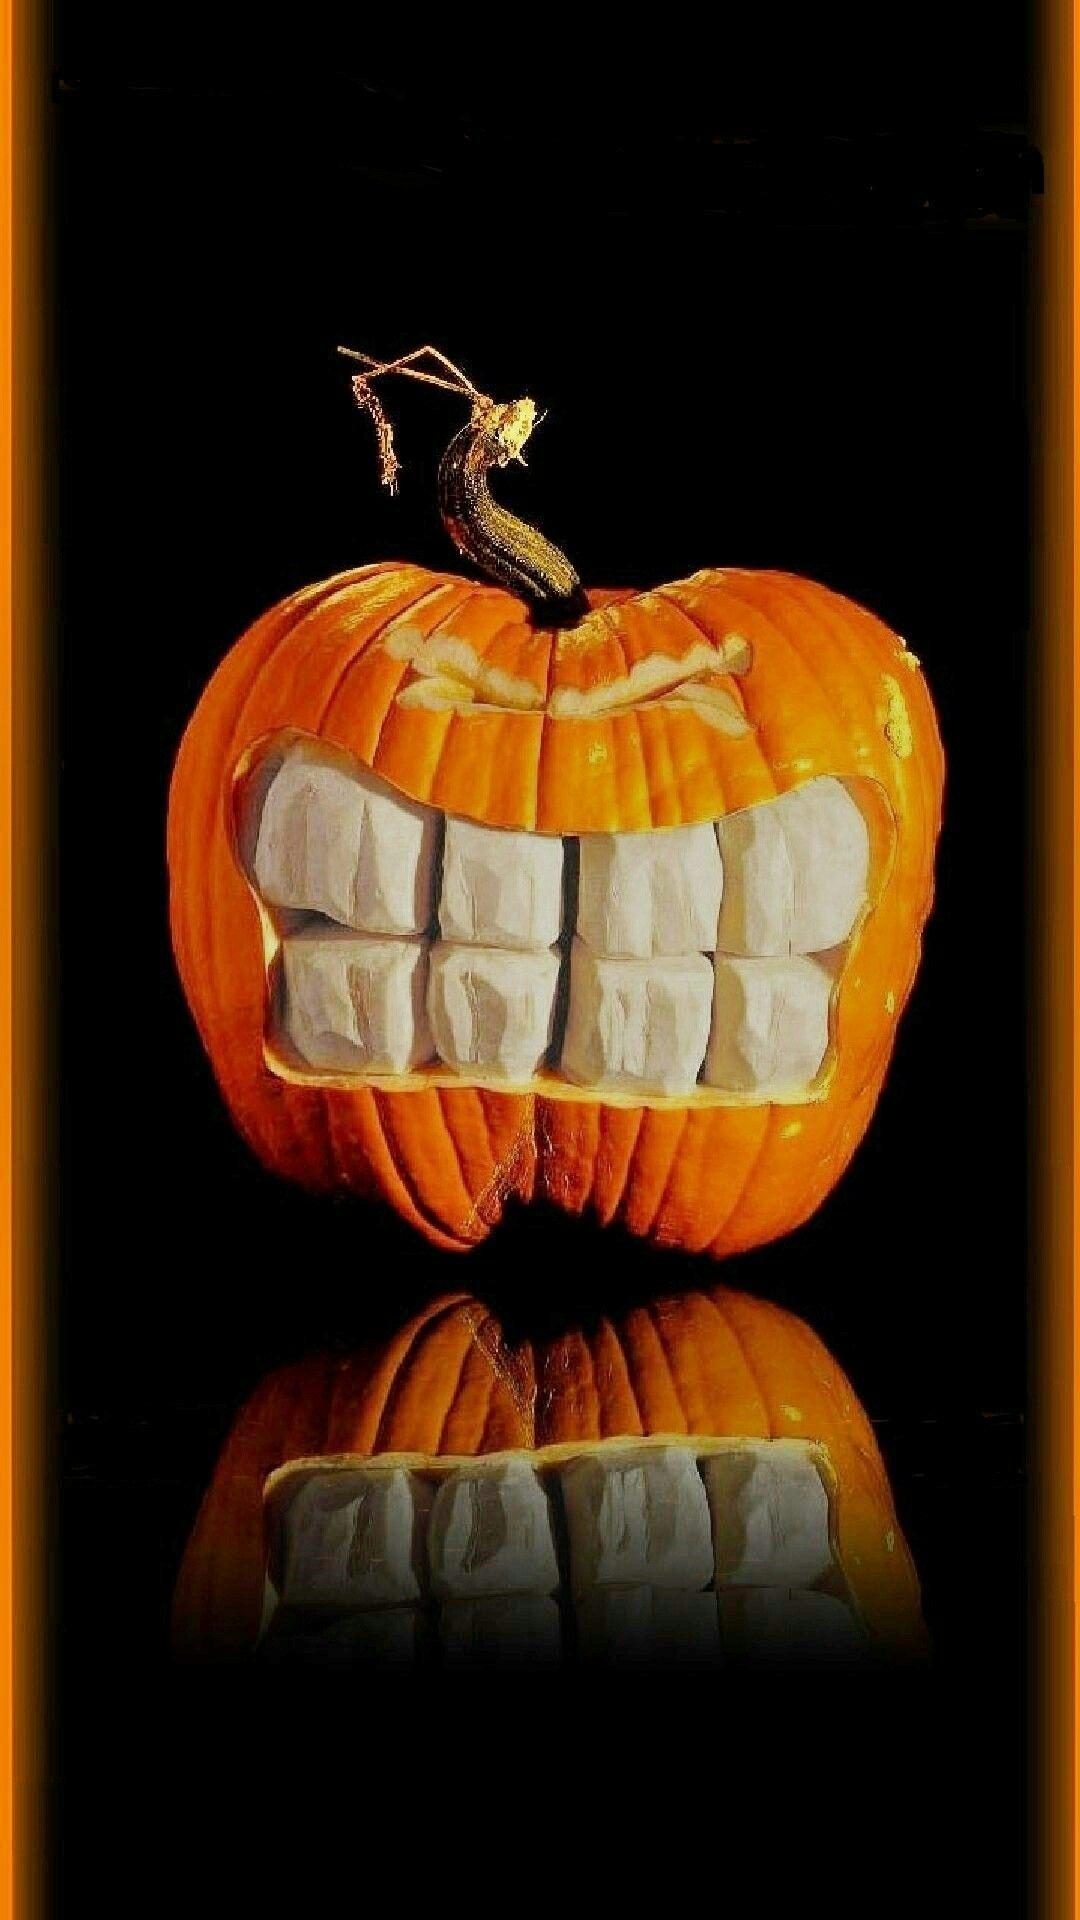 Top Wallpaper Halloween Iphone Se - 9b22486b65d66a476668fe419897b8db  Picture_485685.jpg